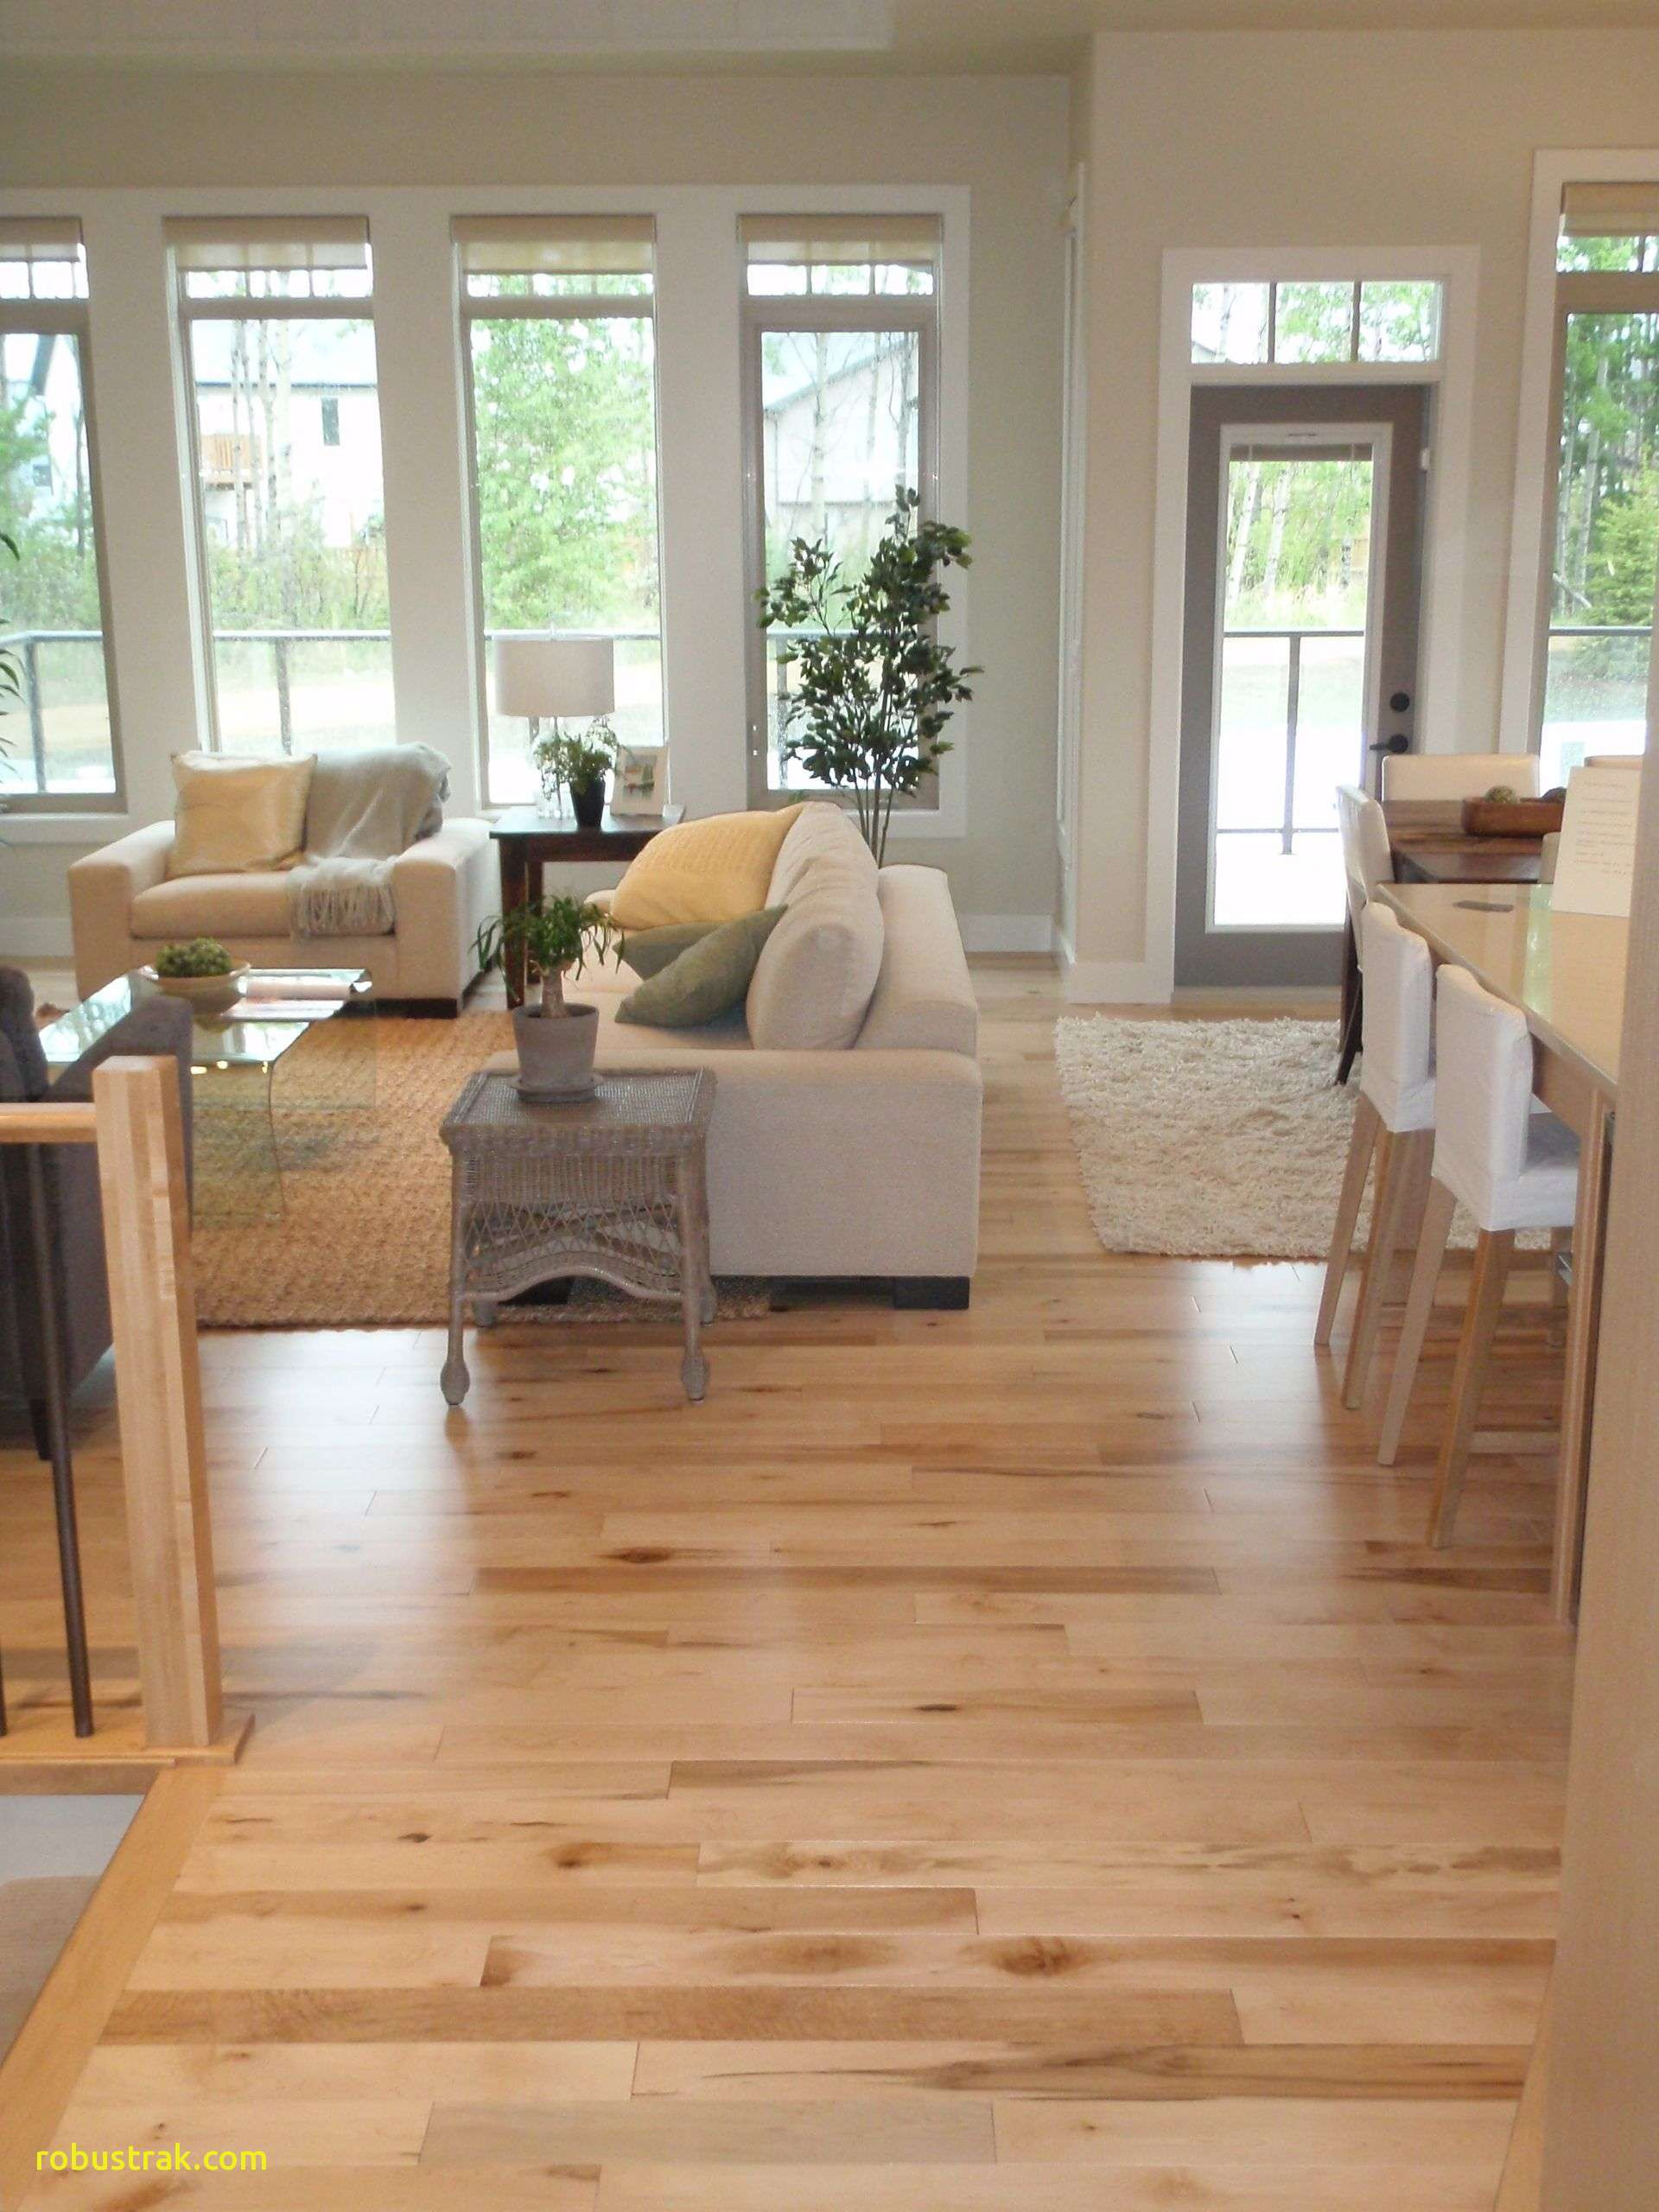 7 hardwood flooring of awesome furniture for light wood floors home design ideas with regard to hardwood floors